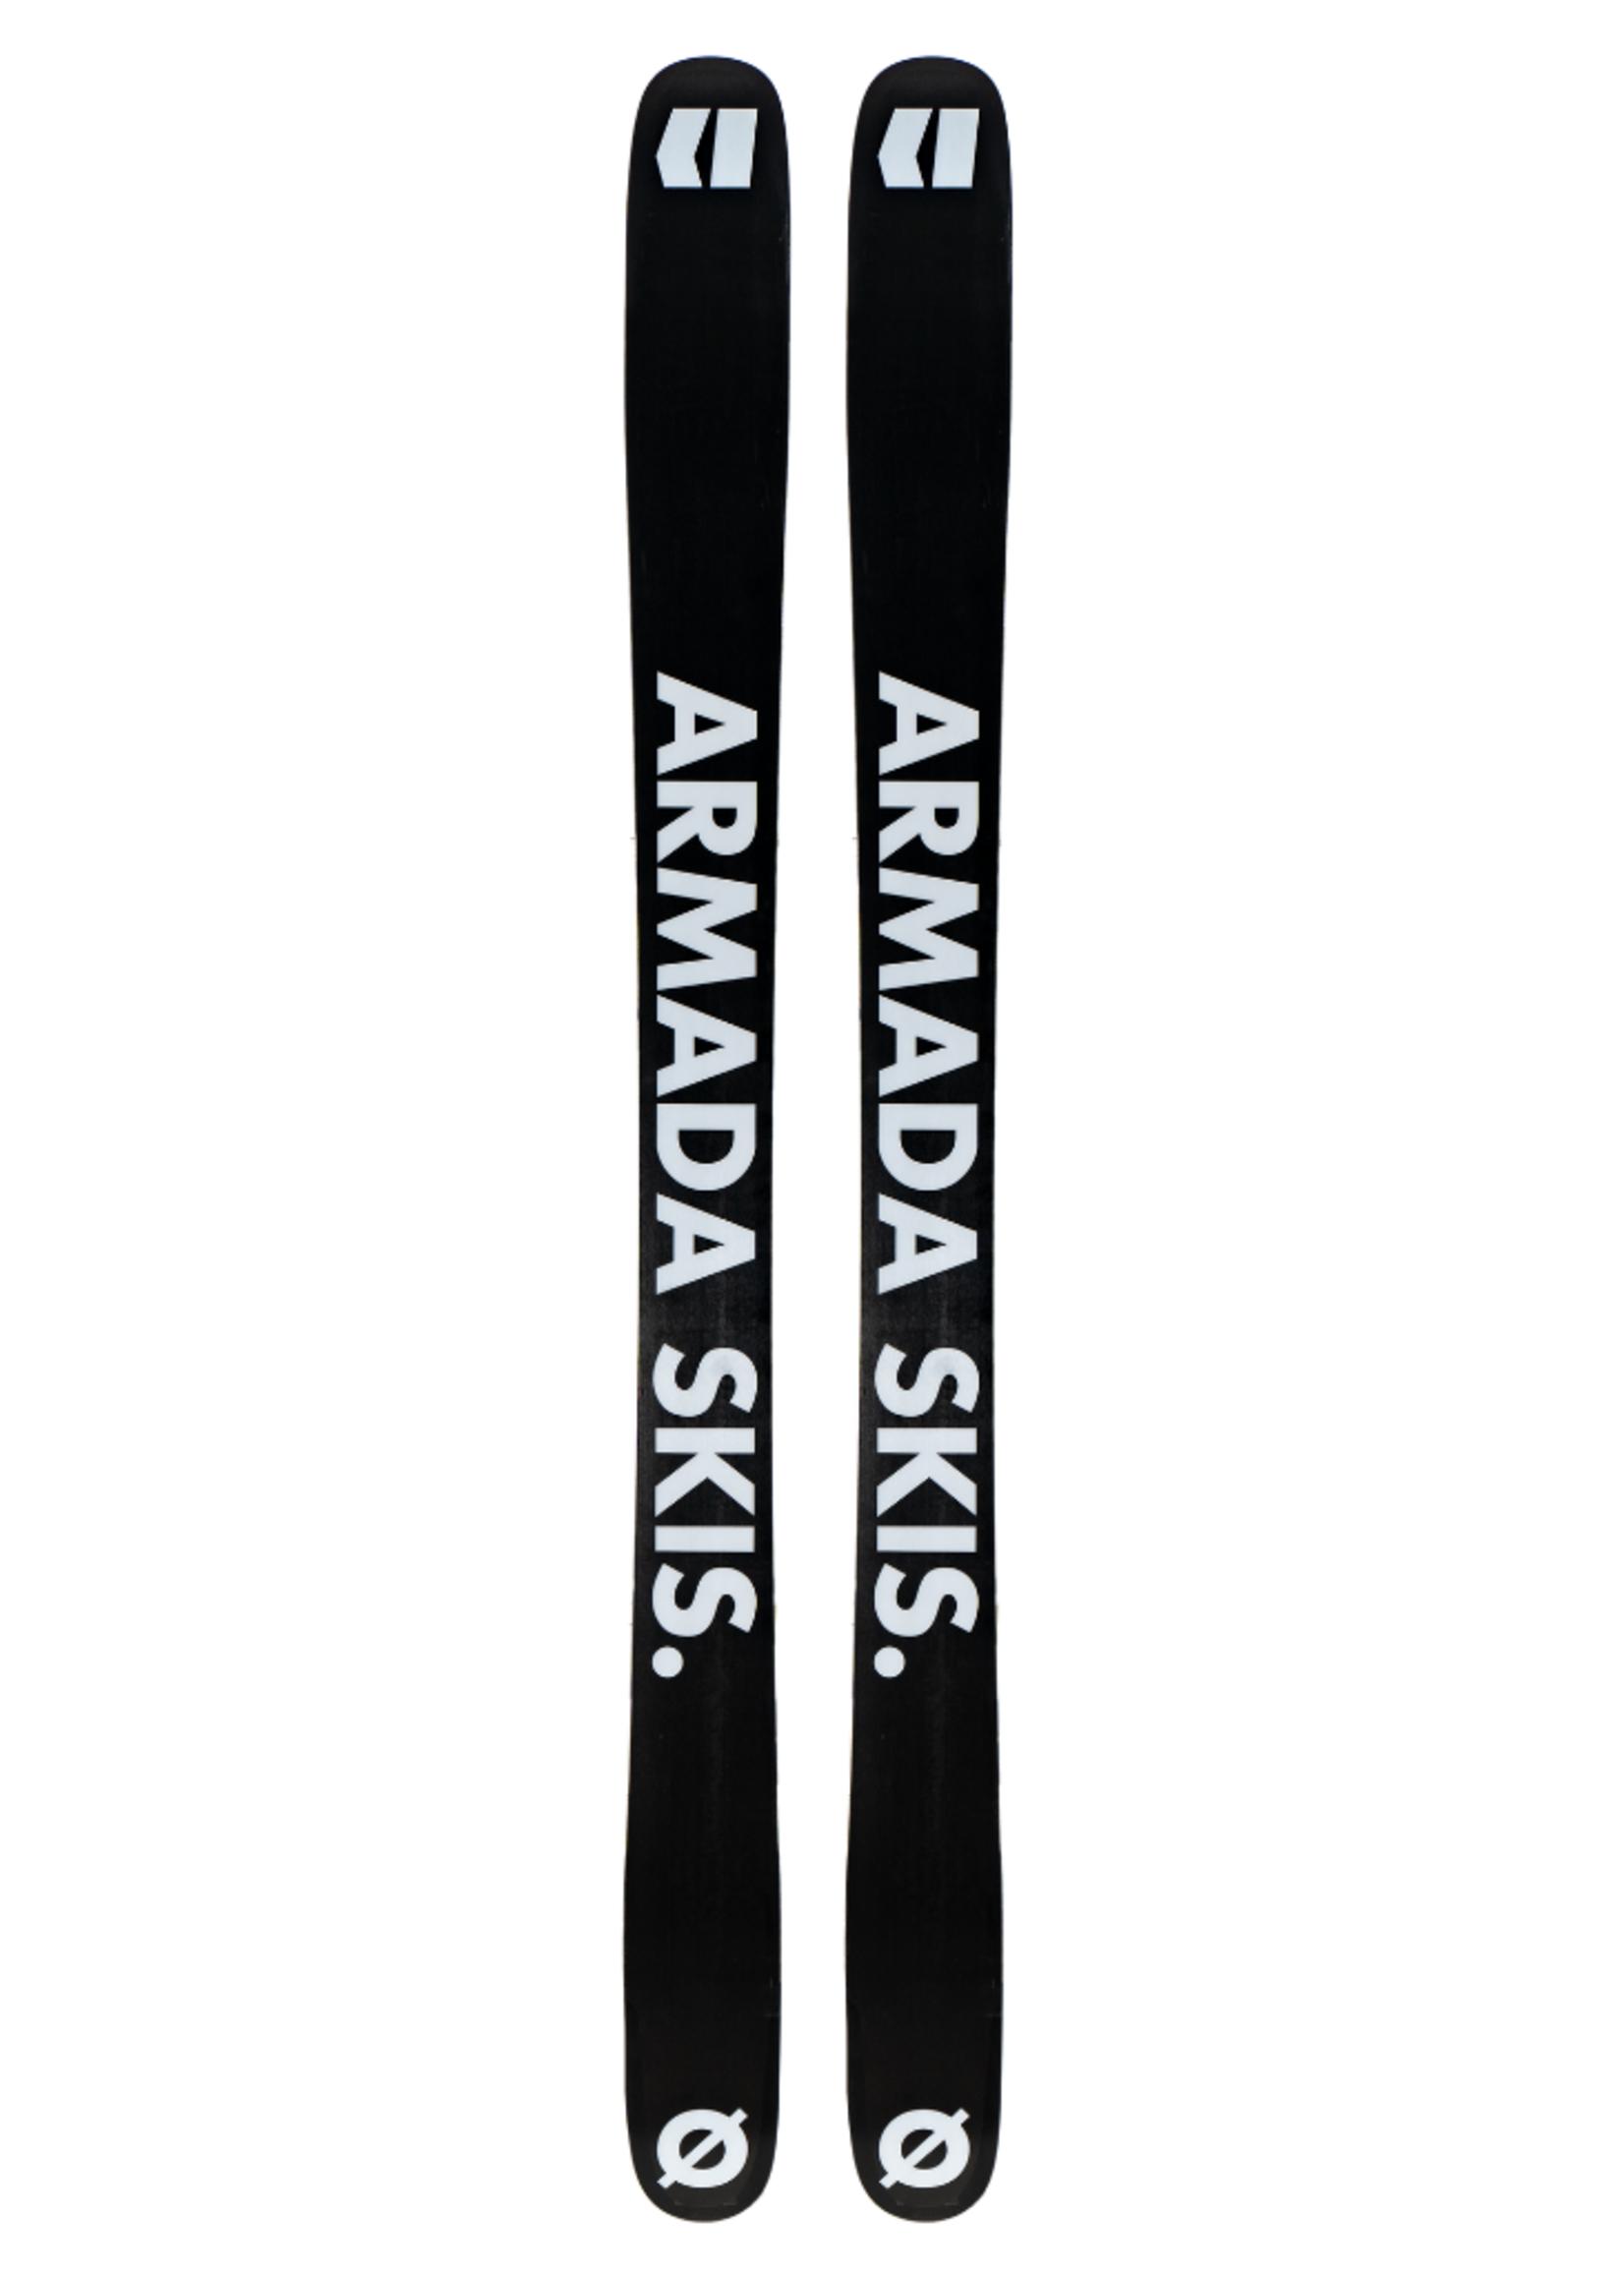 ARMADA SKIS INC 21 ARMADA ARV 116 JJ UL